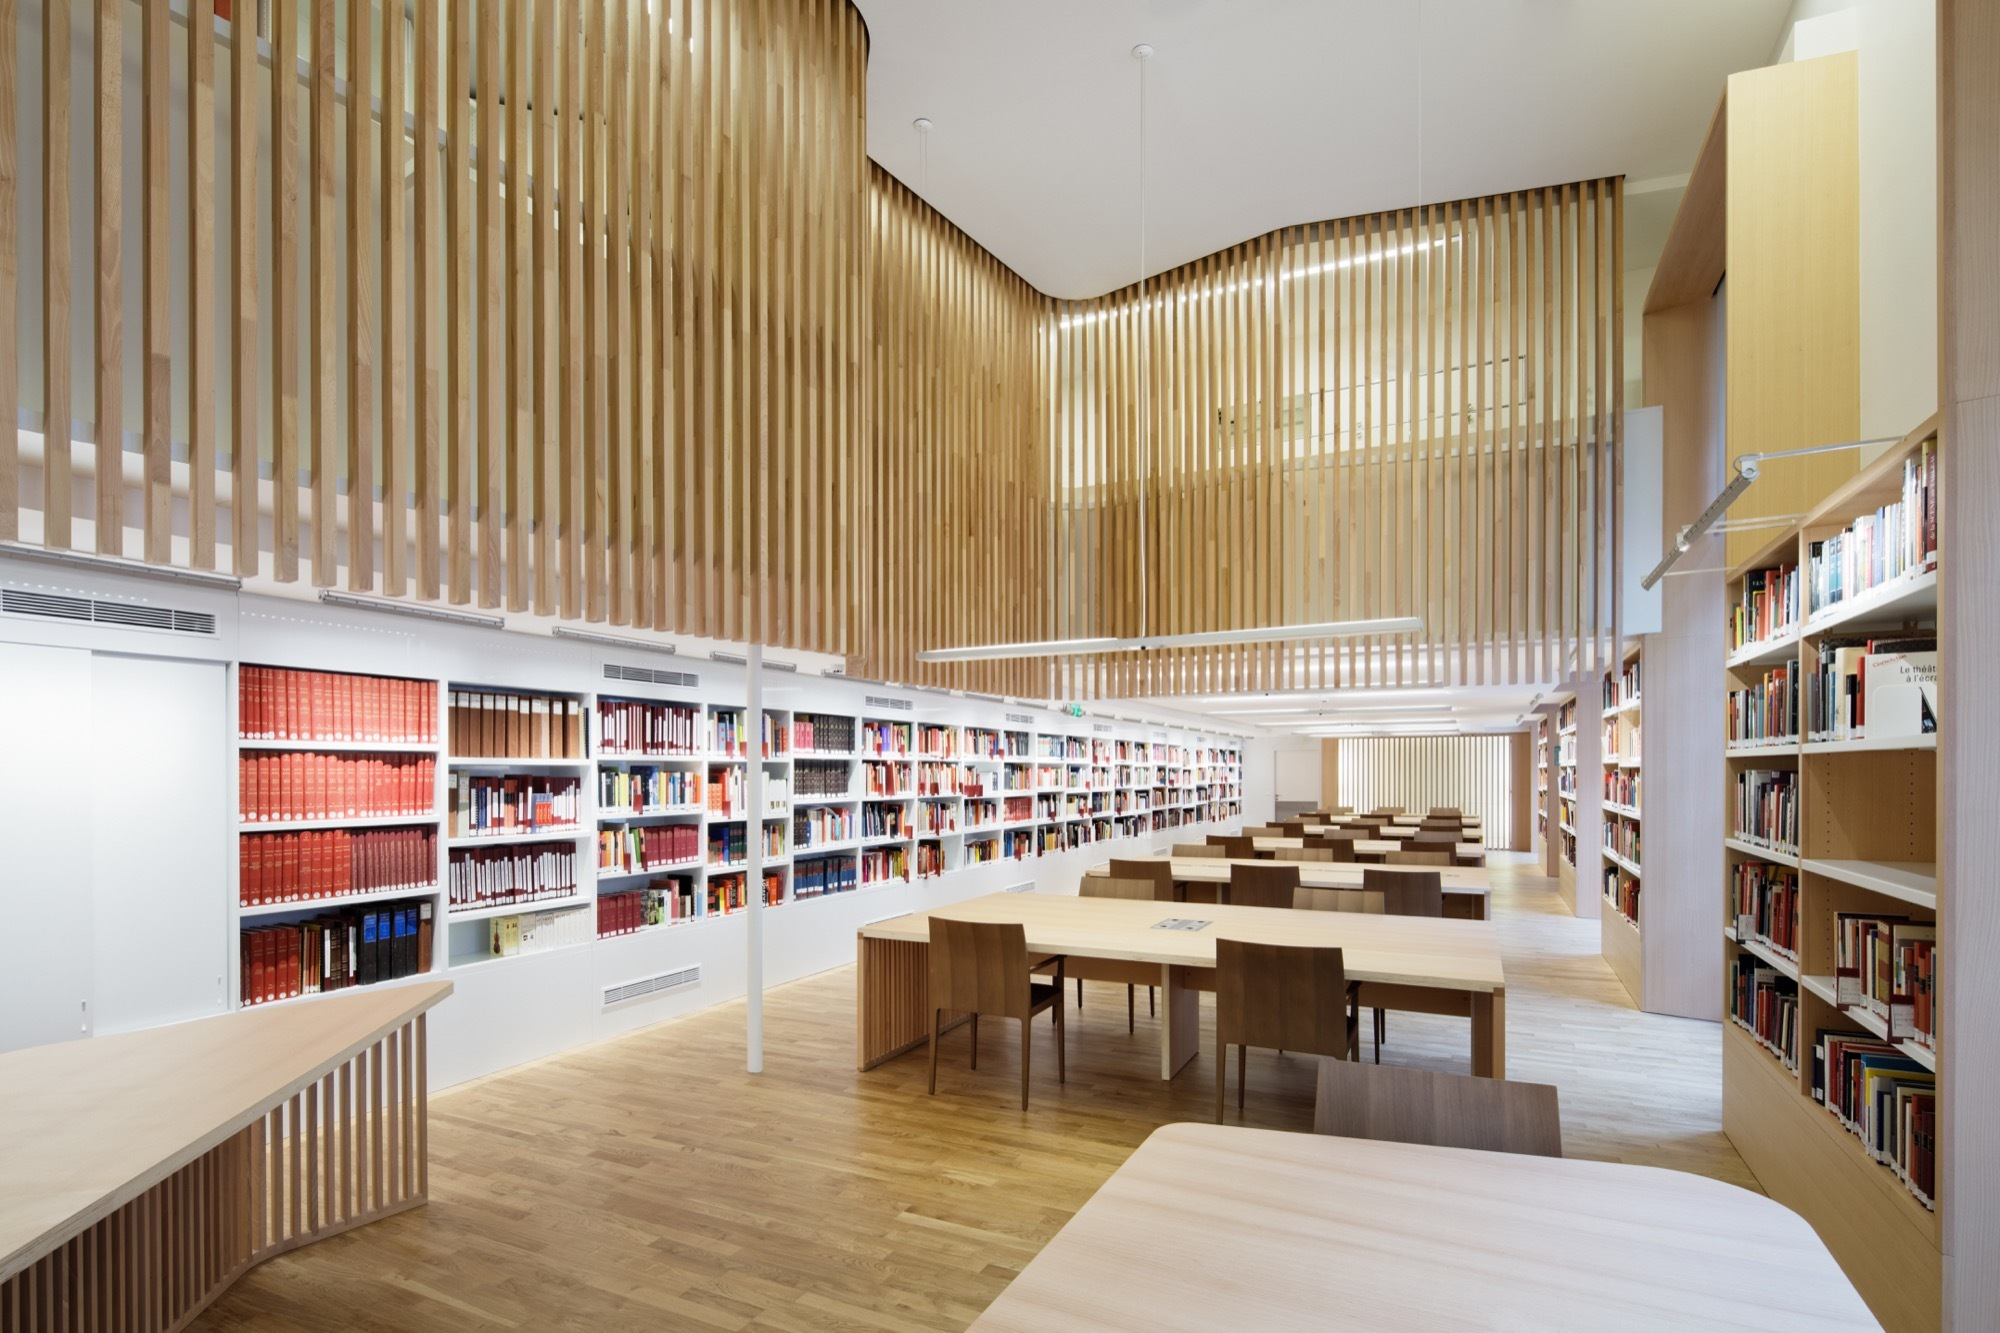 gallery of biblioth que nationale de france refurbishment atelier bruno gaudin virginie. Black Bedroom Furniture Sets. Home Design Ideas